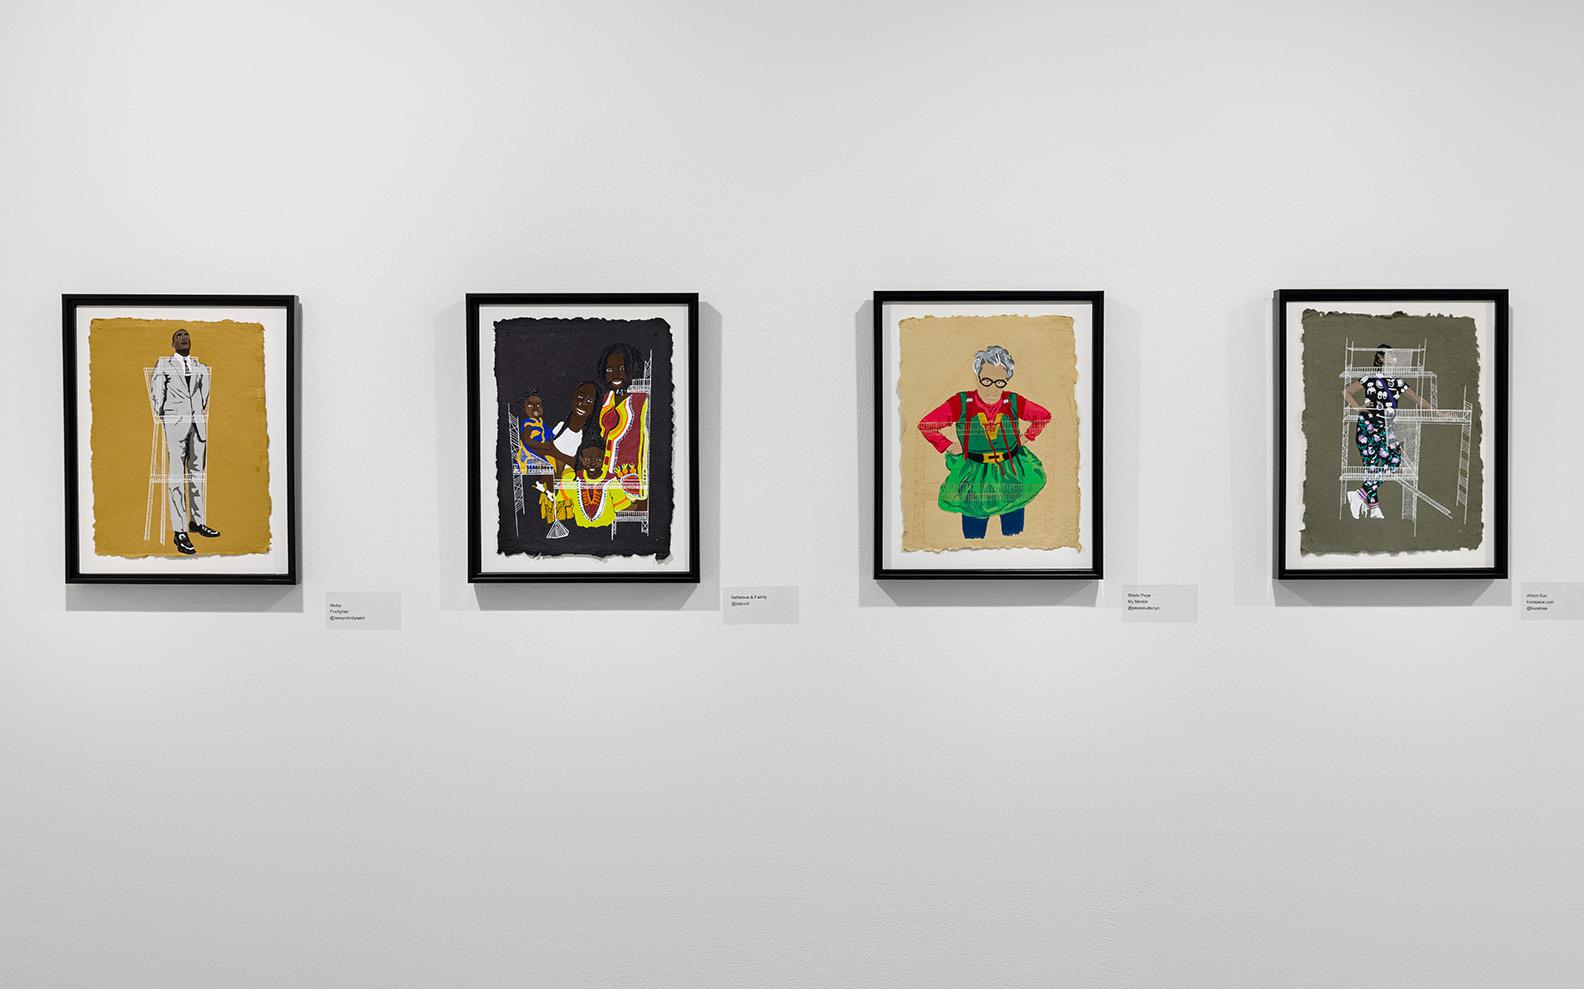 Installation view of Elan Cadiz's exhibition